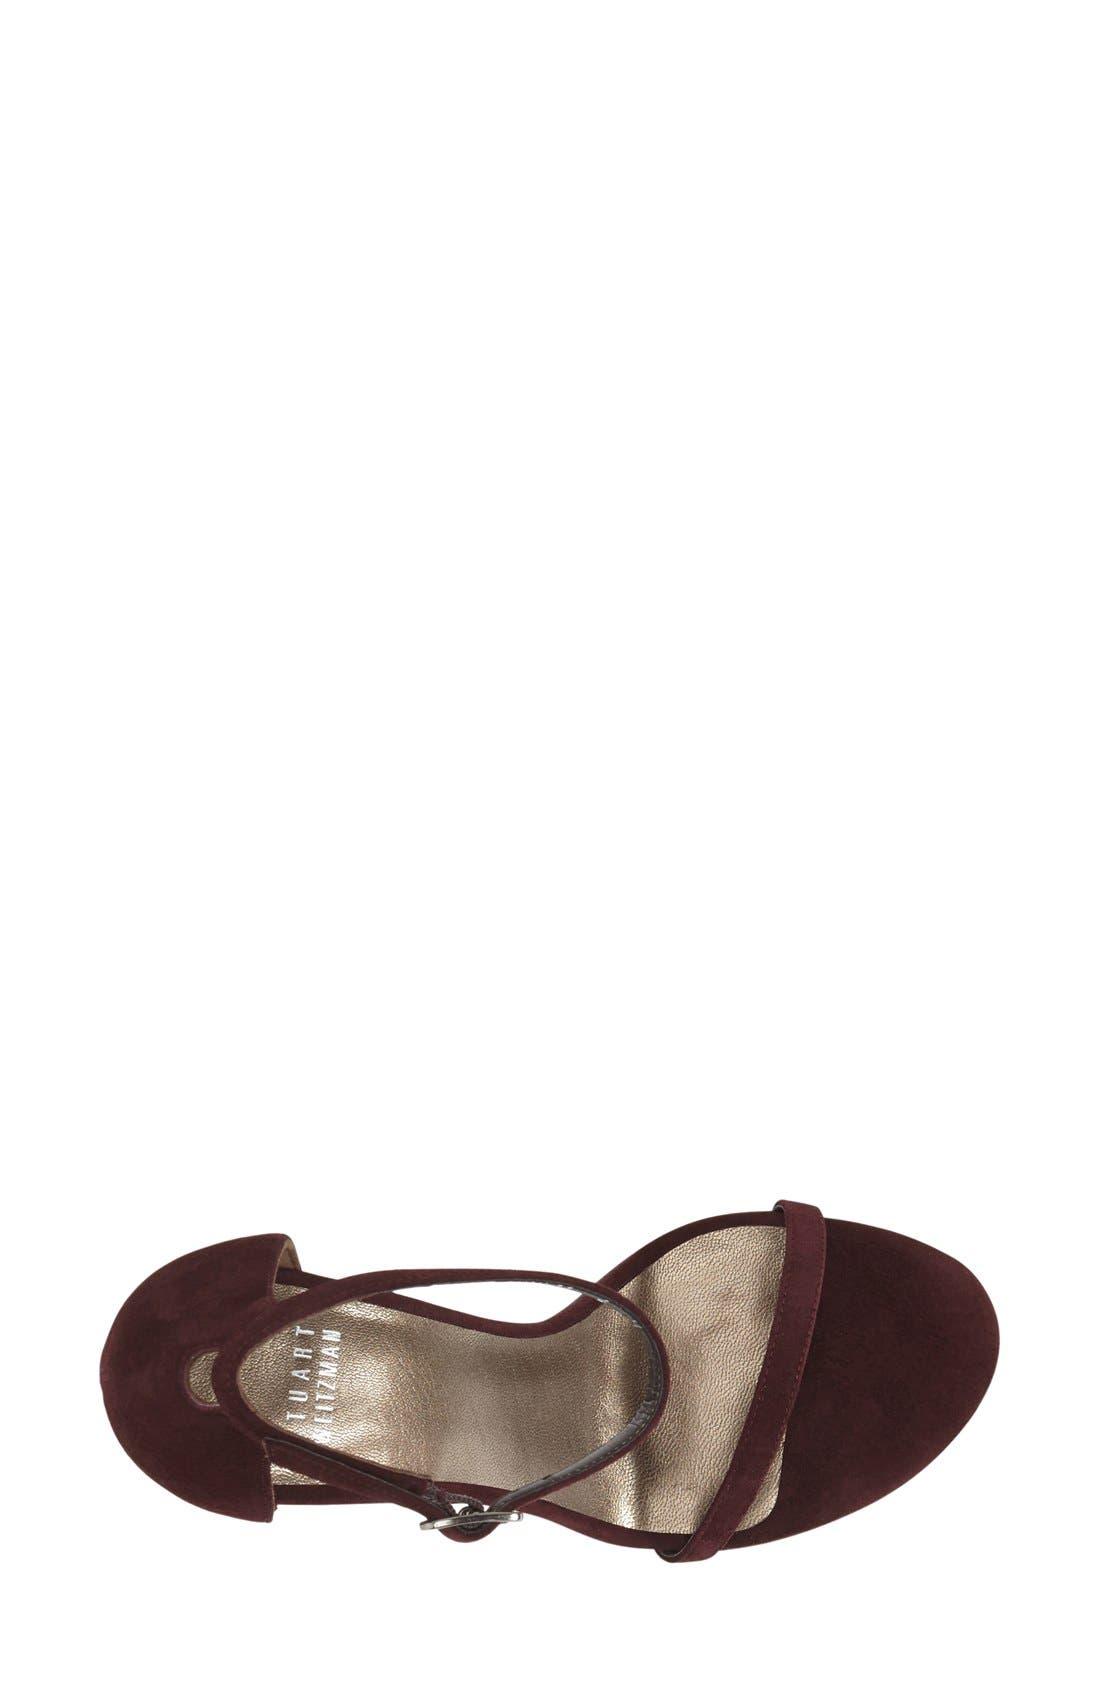 Nudistsong Ankle Strap Sandal,                             Alternate thumbnail 120, color,